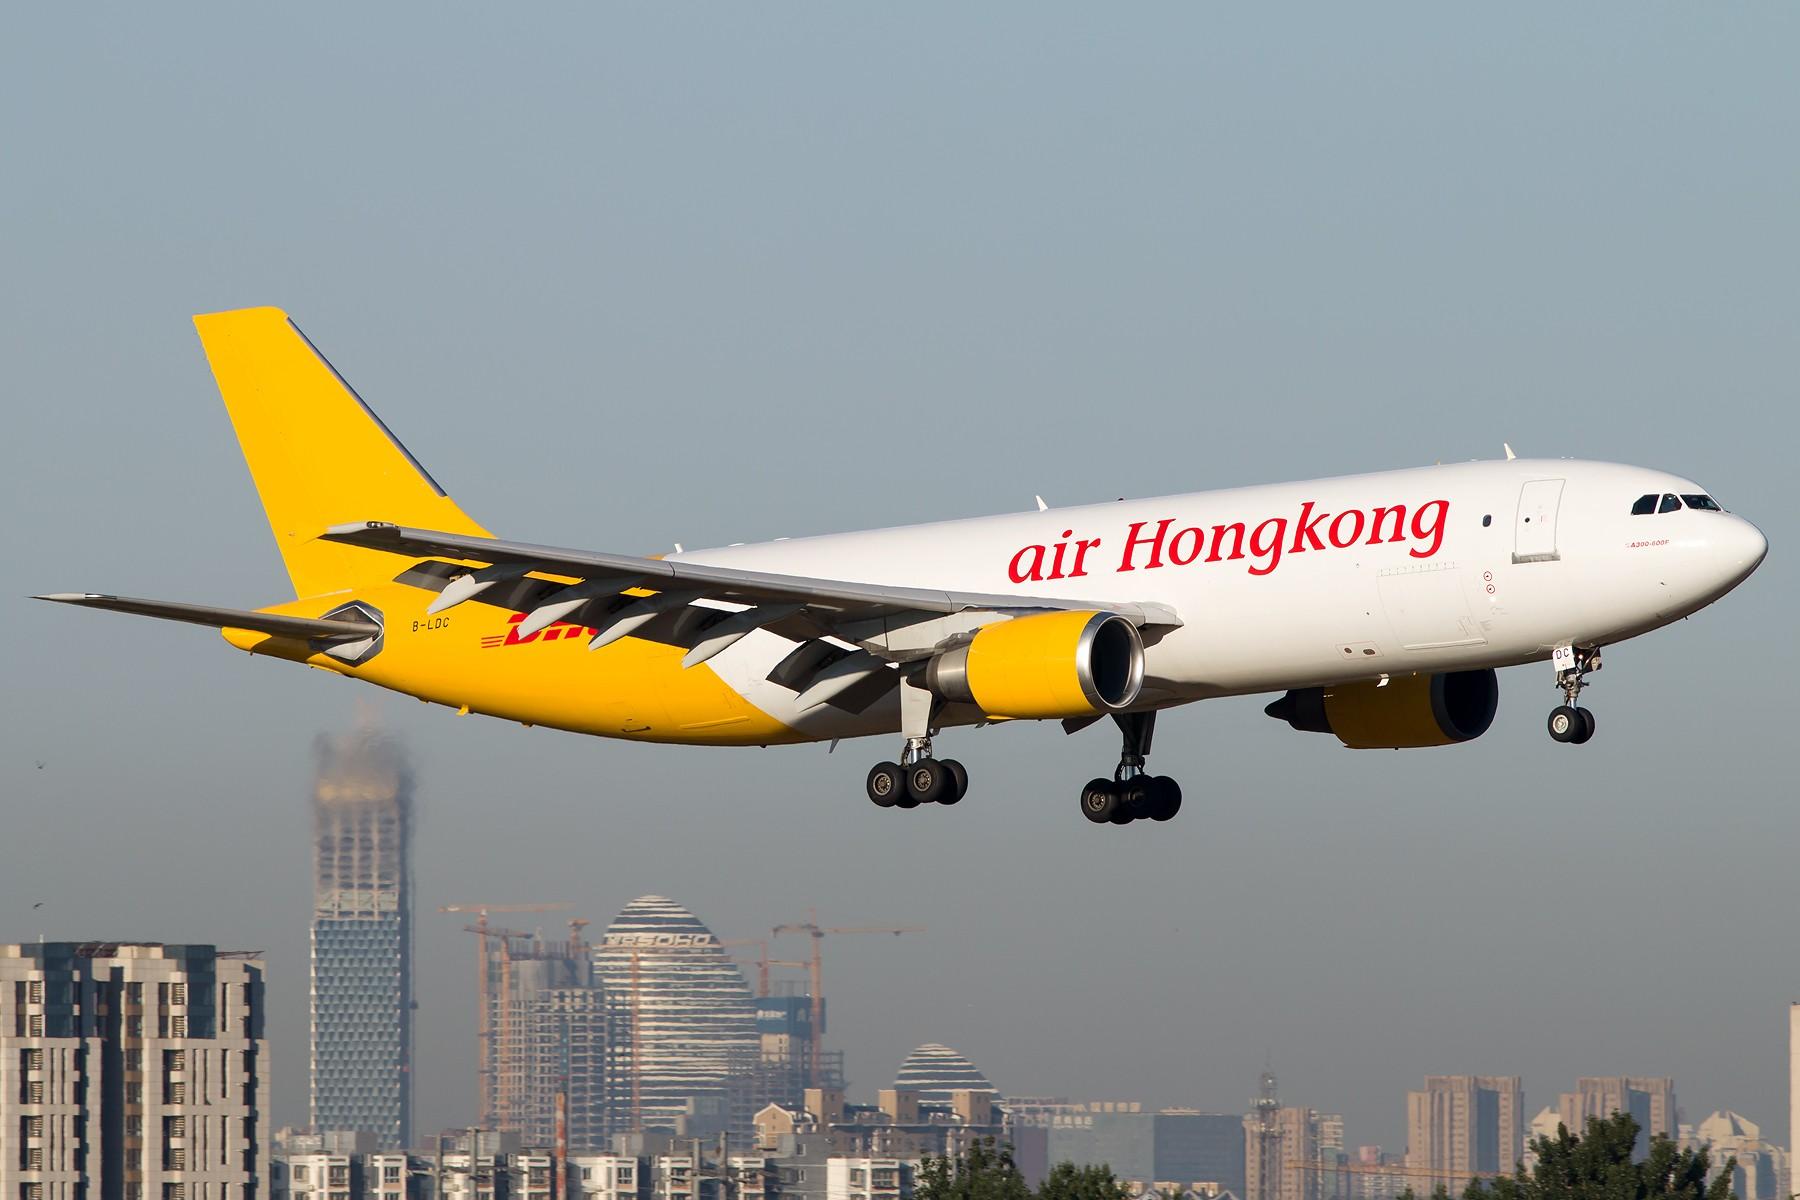 Re:[原创]周末晨练10张 1800*1200 AIRBUS A300F4-600R B-LDC 中国北京首都国际机场